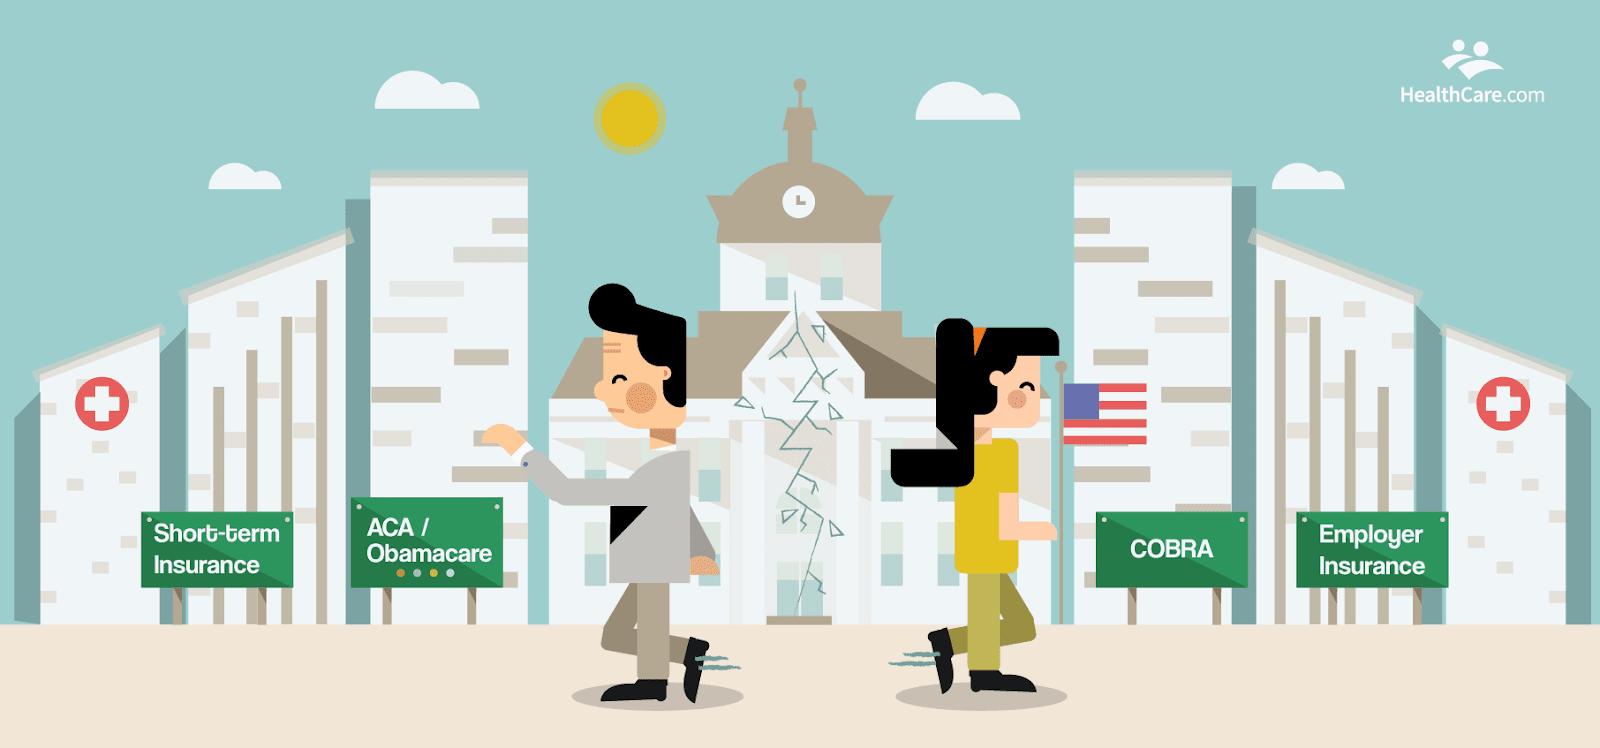 divorce health insurance | split couple walking away to health insurance